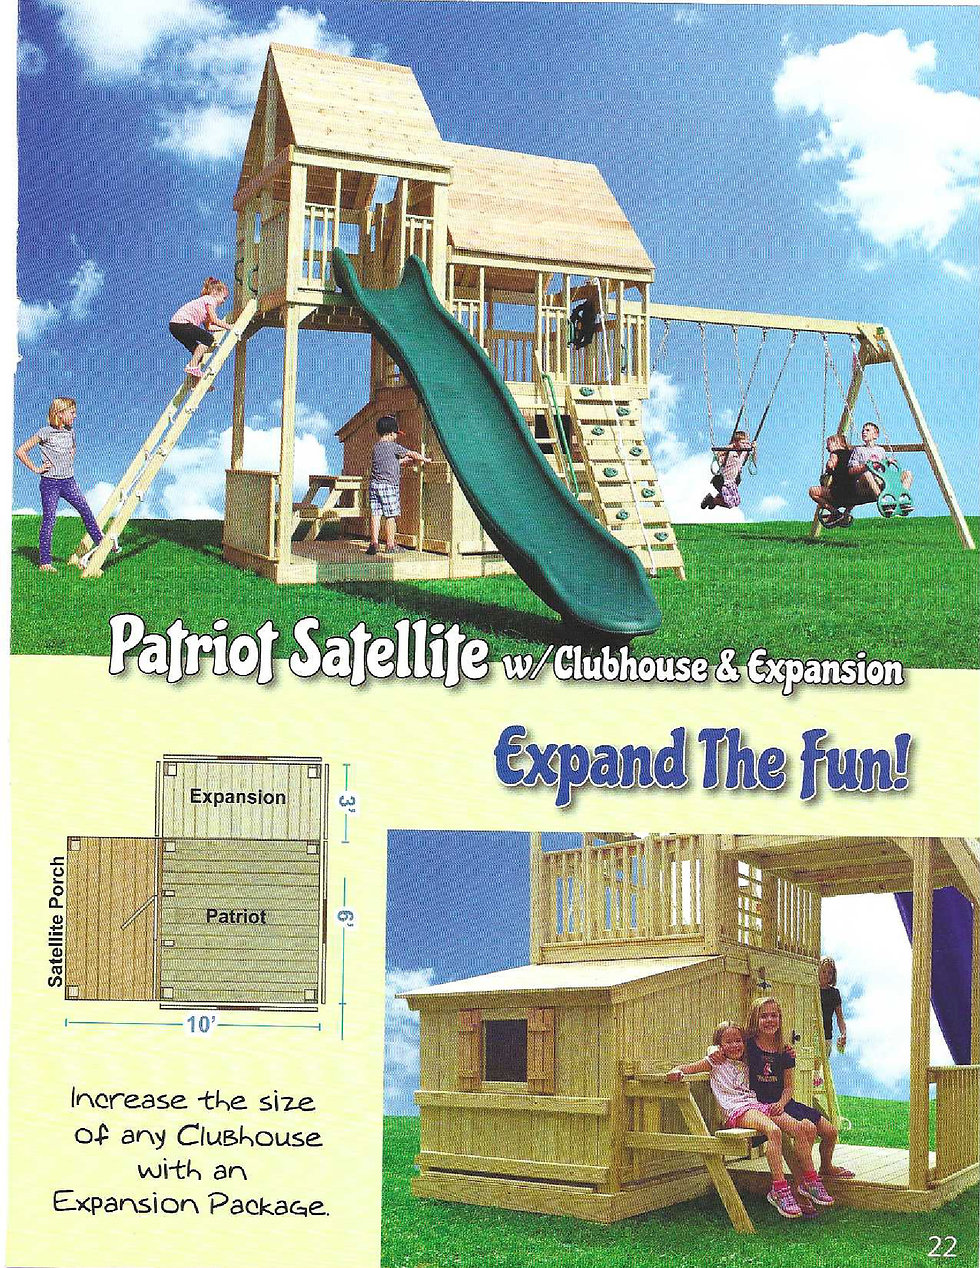 Patriot Satellite clubhouse expansion.jp